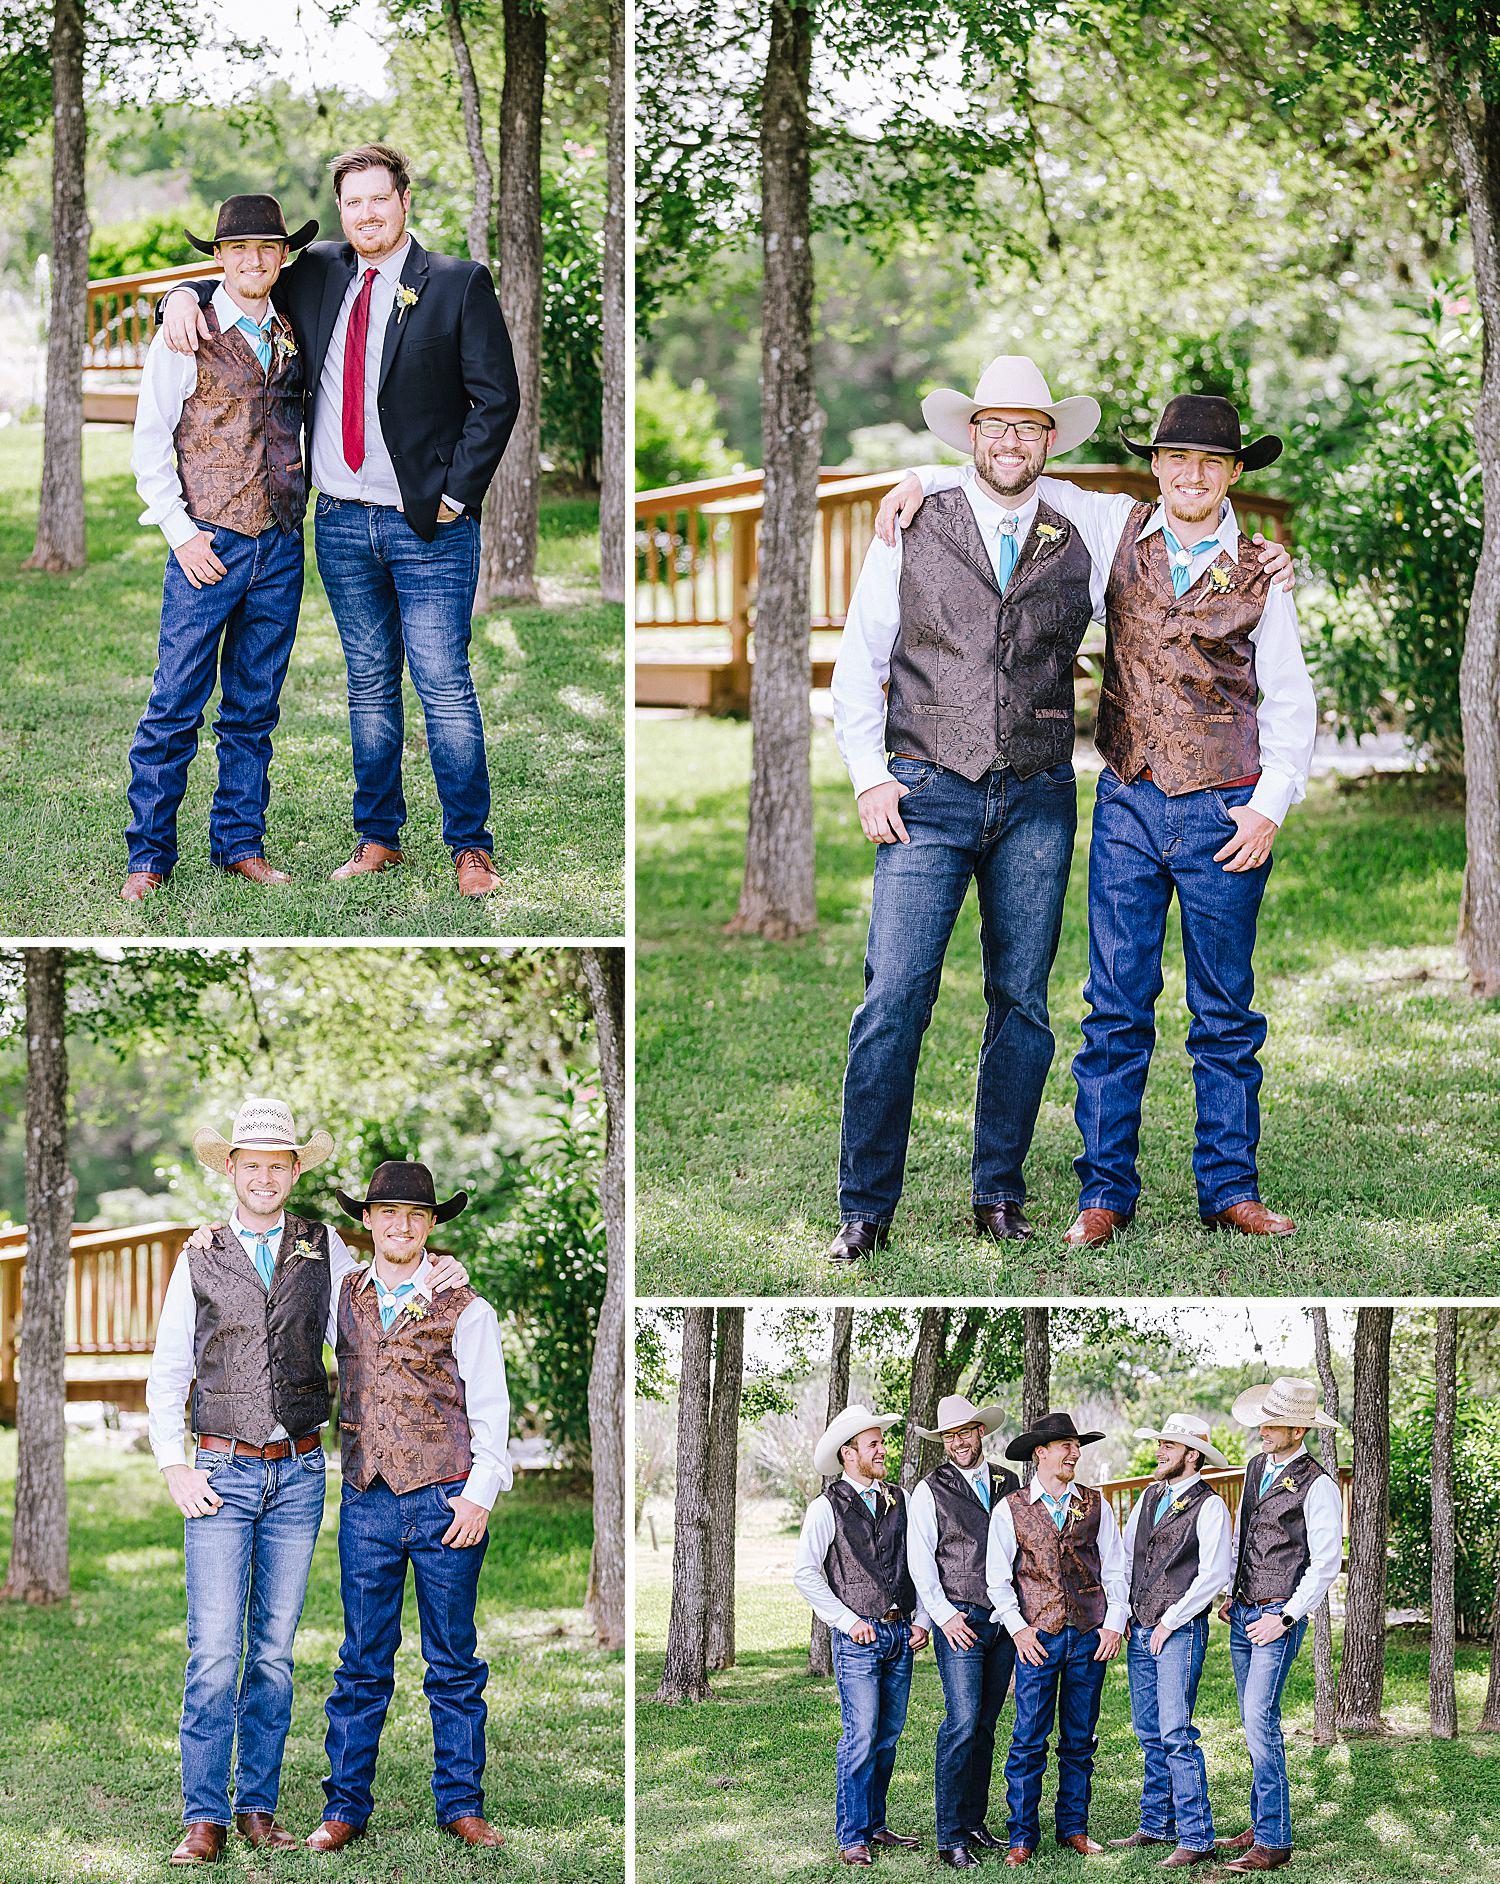 Carly-Barton-Photography-Old-Town-Texas-Rustic-Wedding-Photos-Sunflowers-Boots-Kyle-Texas_0058.jpg